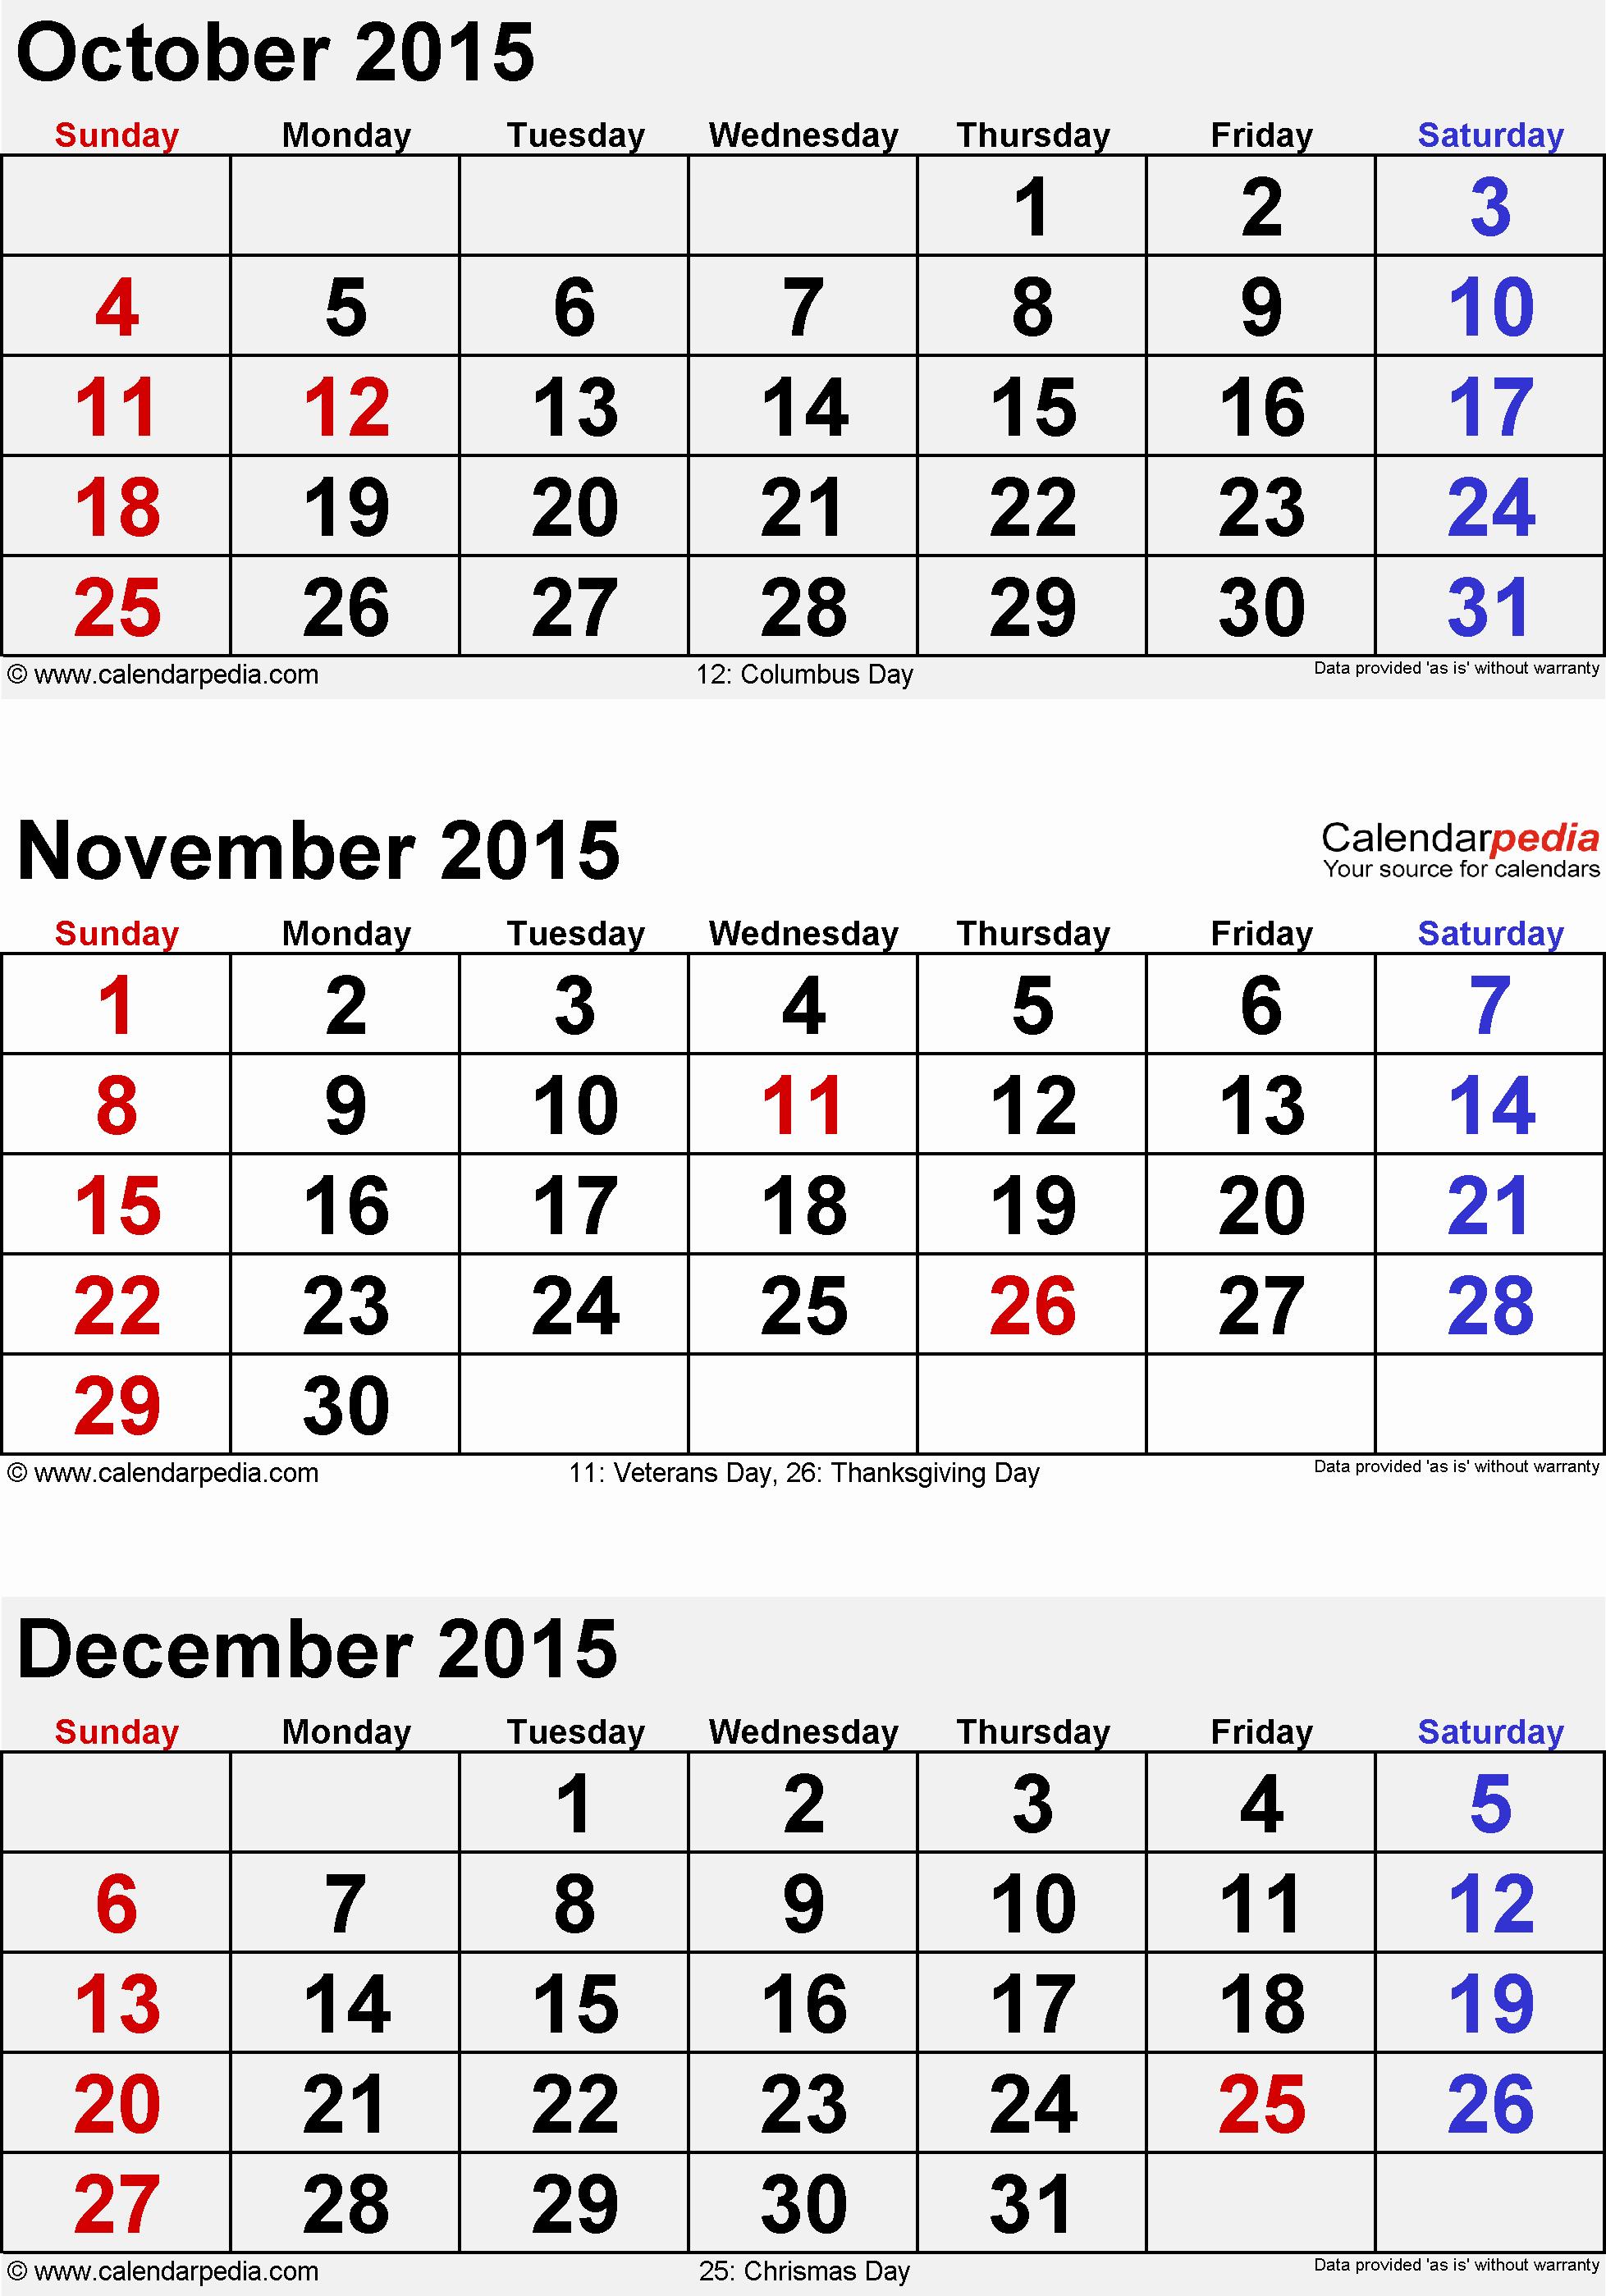 December 2015 Calendar Word Document Beautiful December 2015 Calendars for Word Excel & Pdf